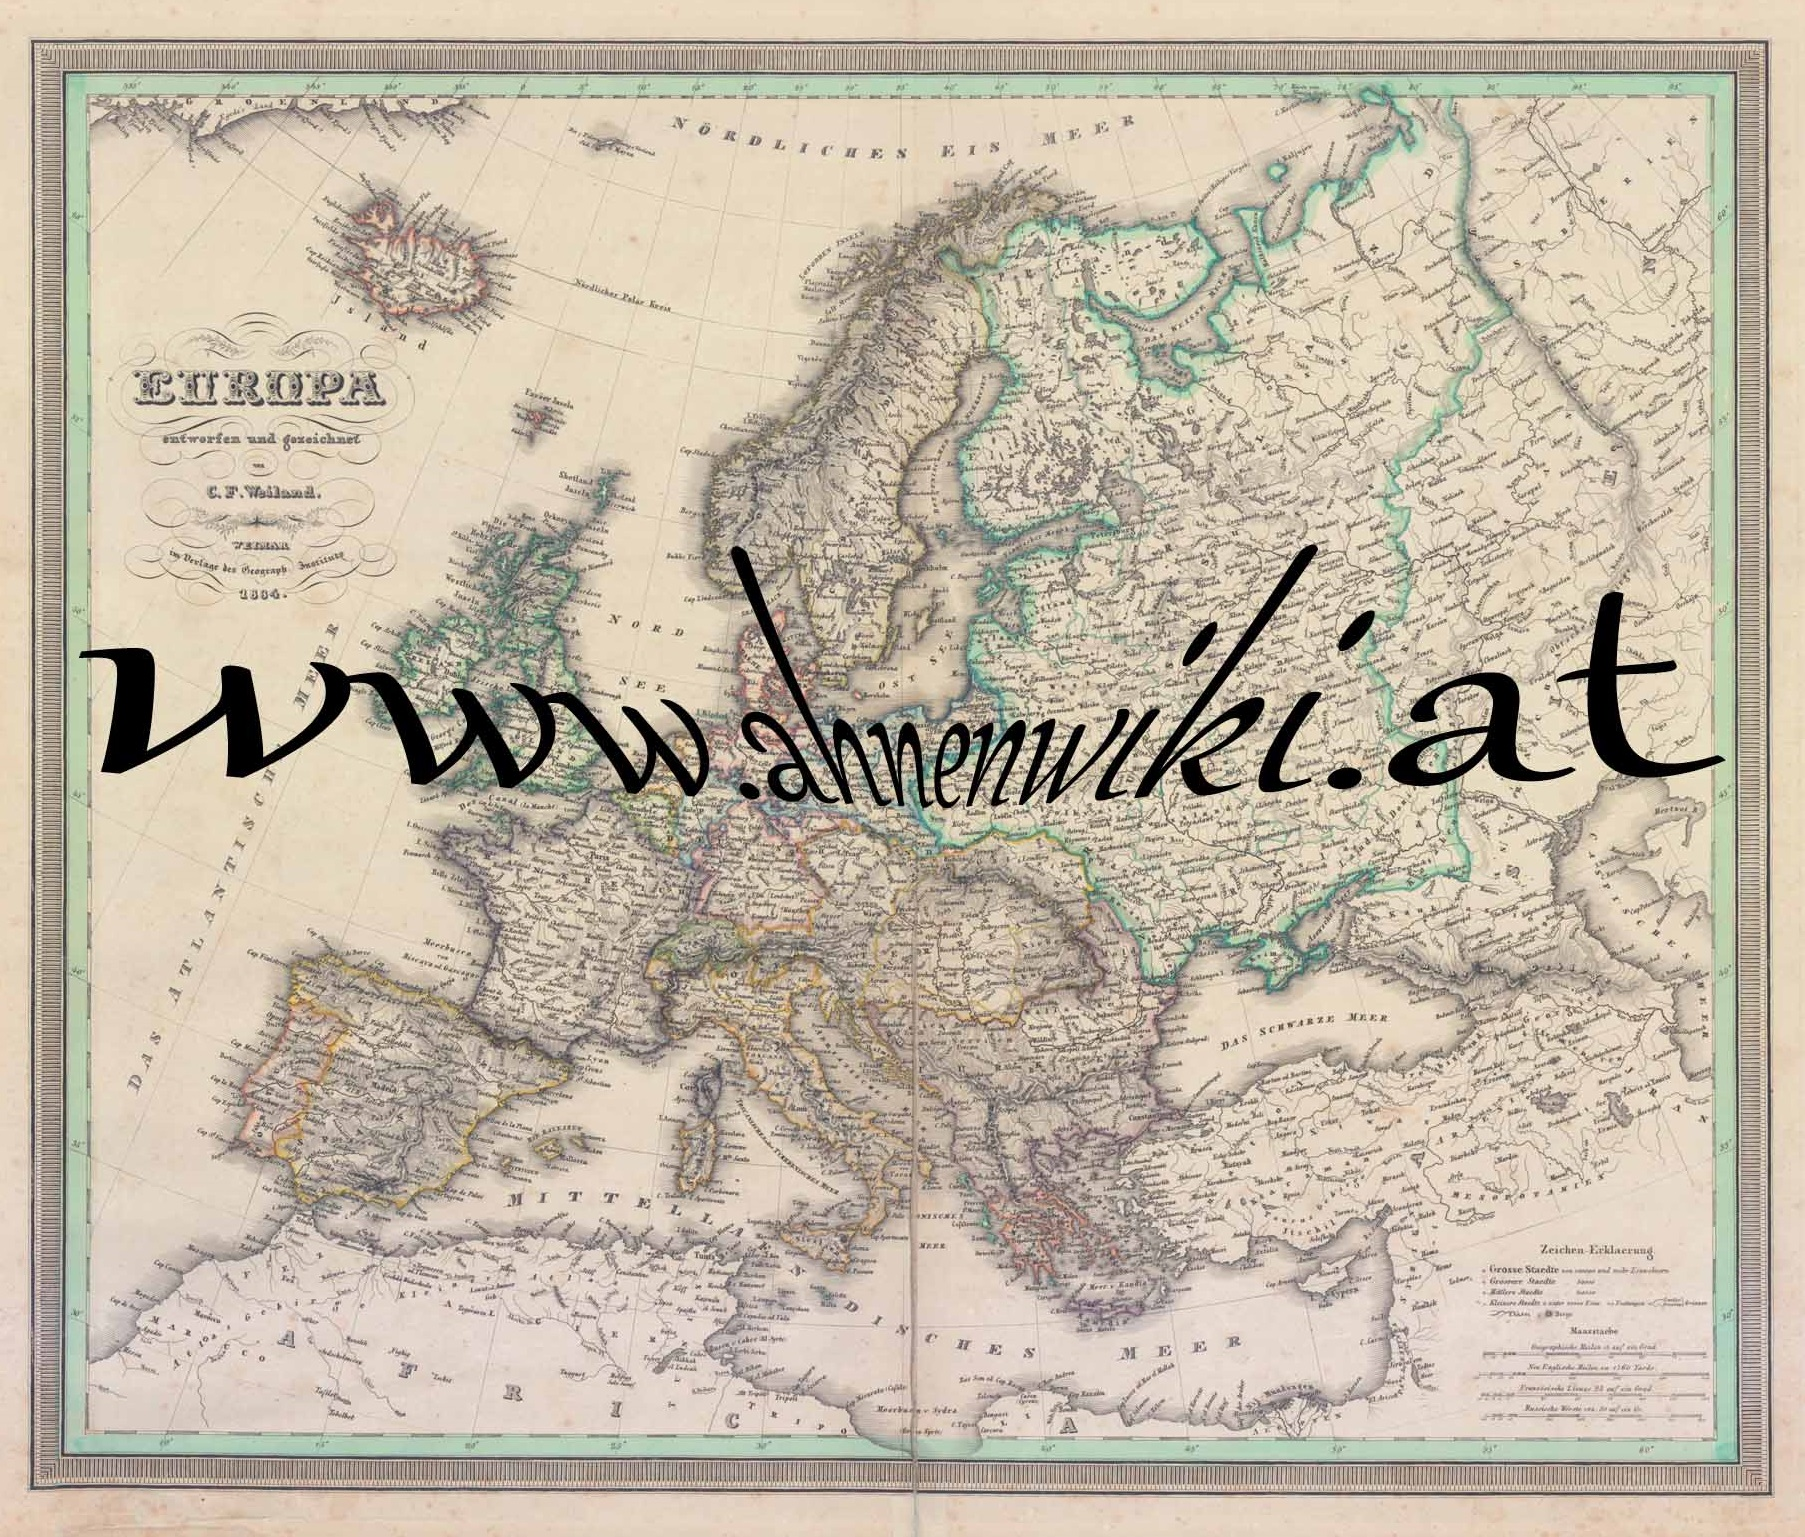 105005-europa-1834